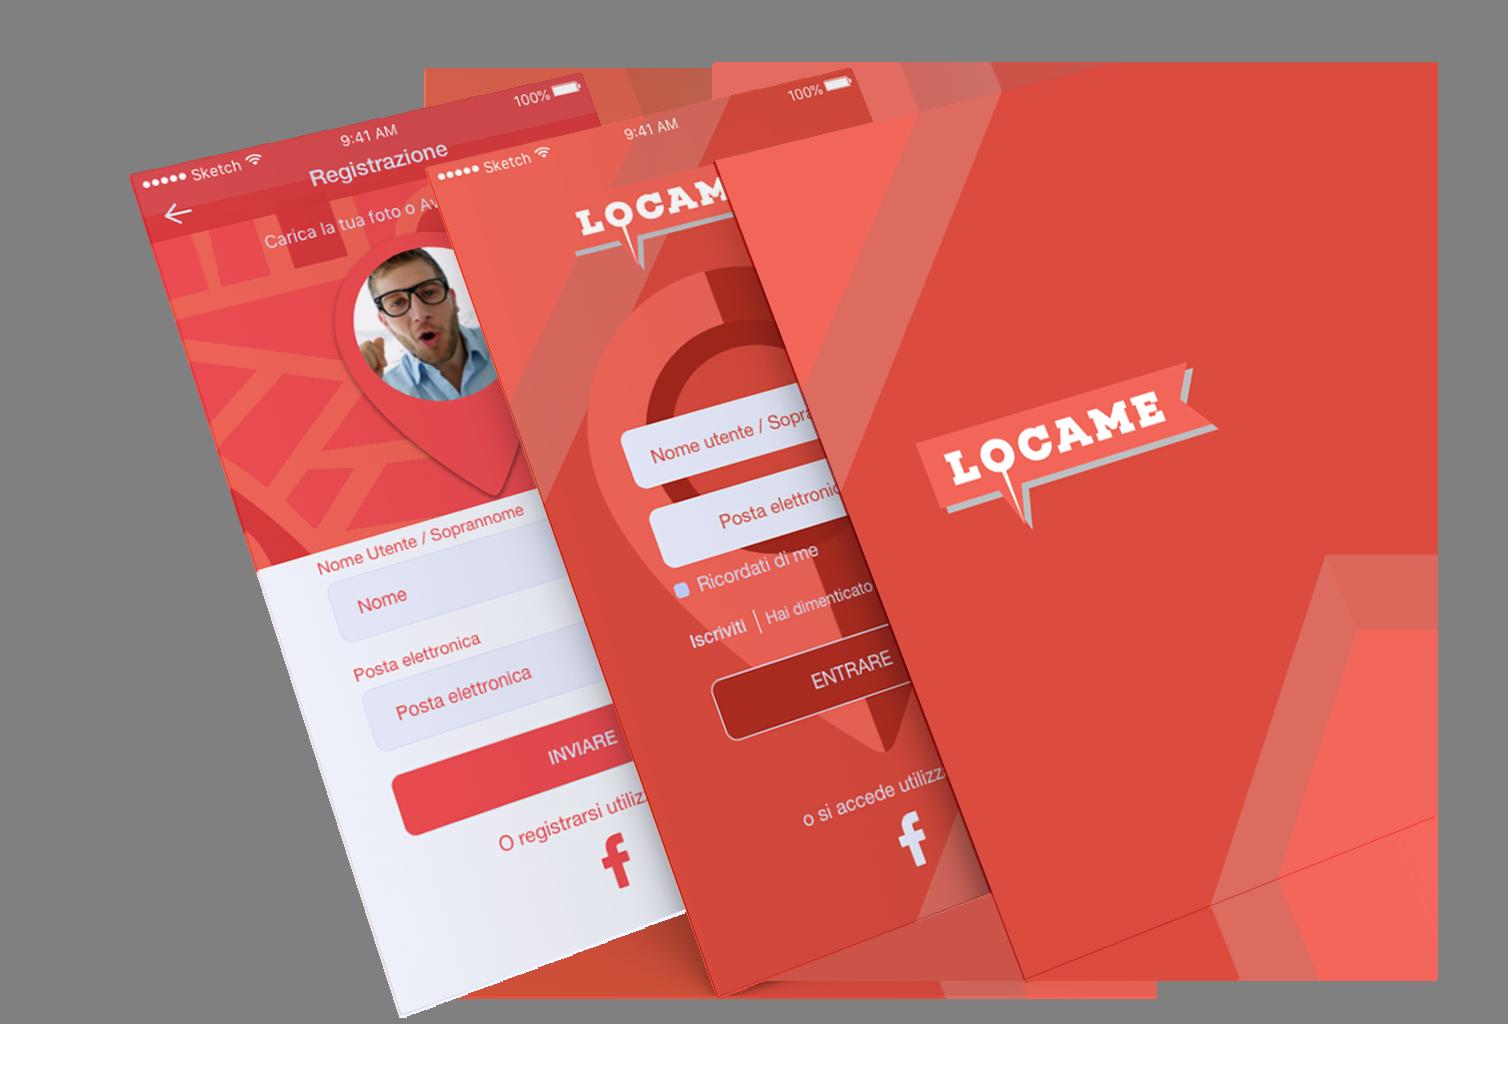 app-locame